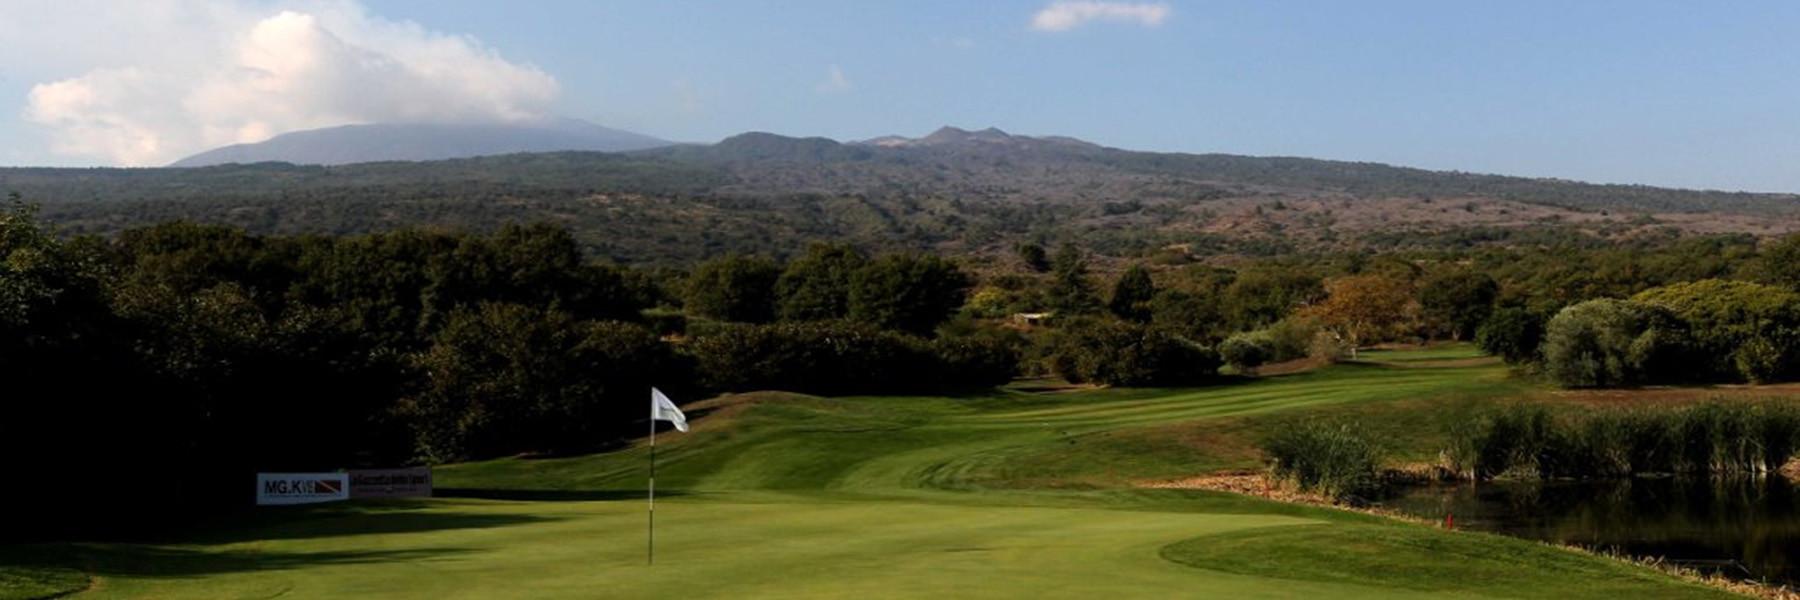 Am Fuße des Etna liegt der älteste Golf Club Siziliens - Il Picciolo Golf